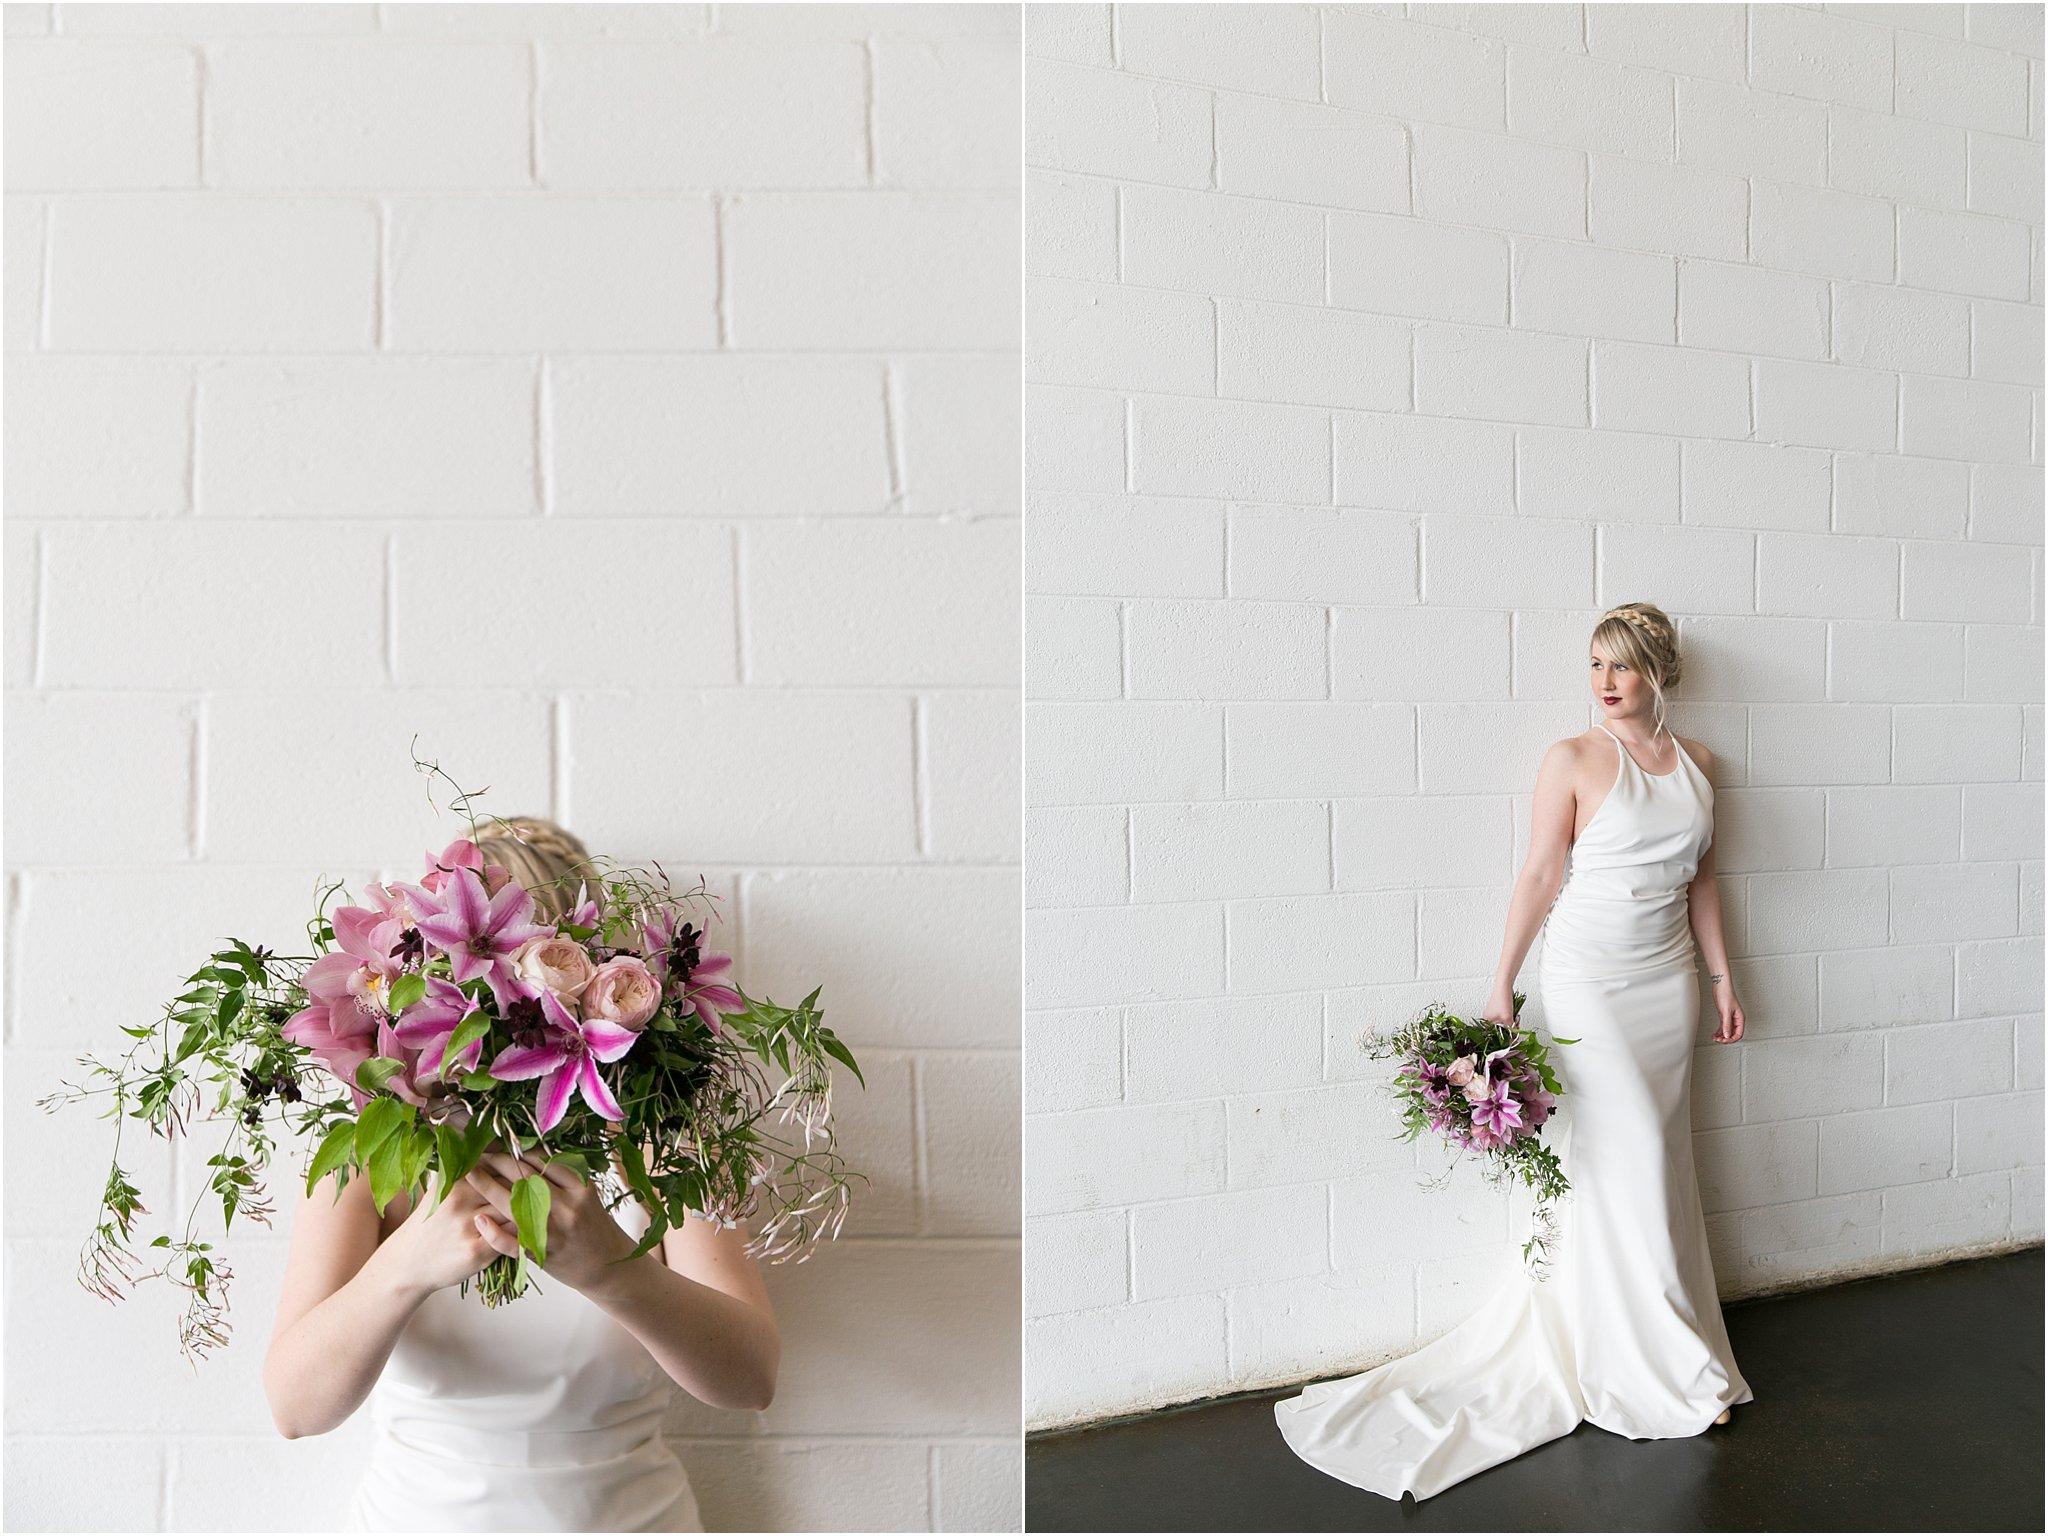 jessica_ryan_photography_oconnor_brewing_wedding_oconnor_brewing_co_norfolk_virginia_roost_flowers_blue_birds_garage__0793